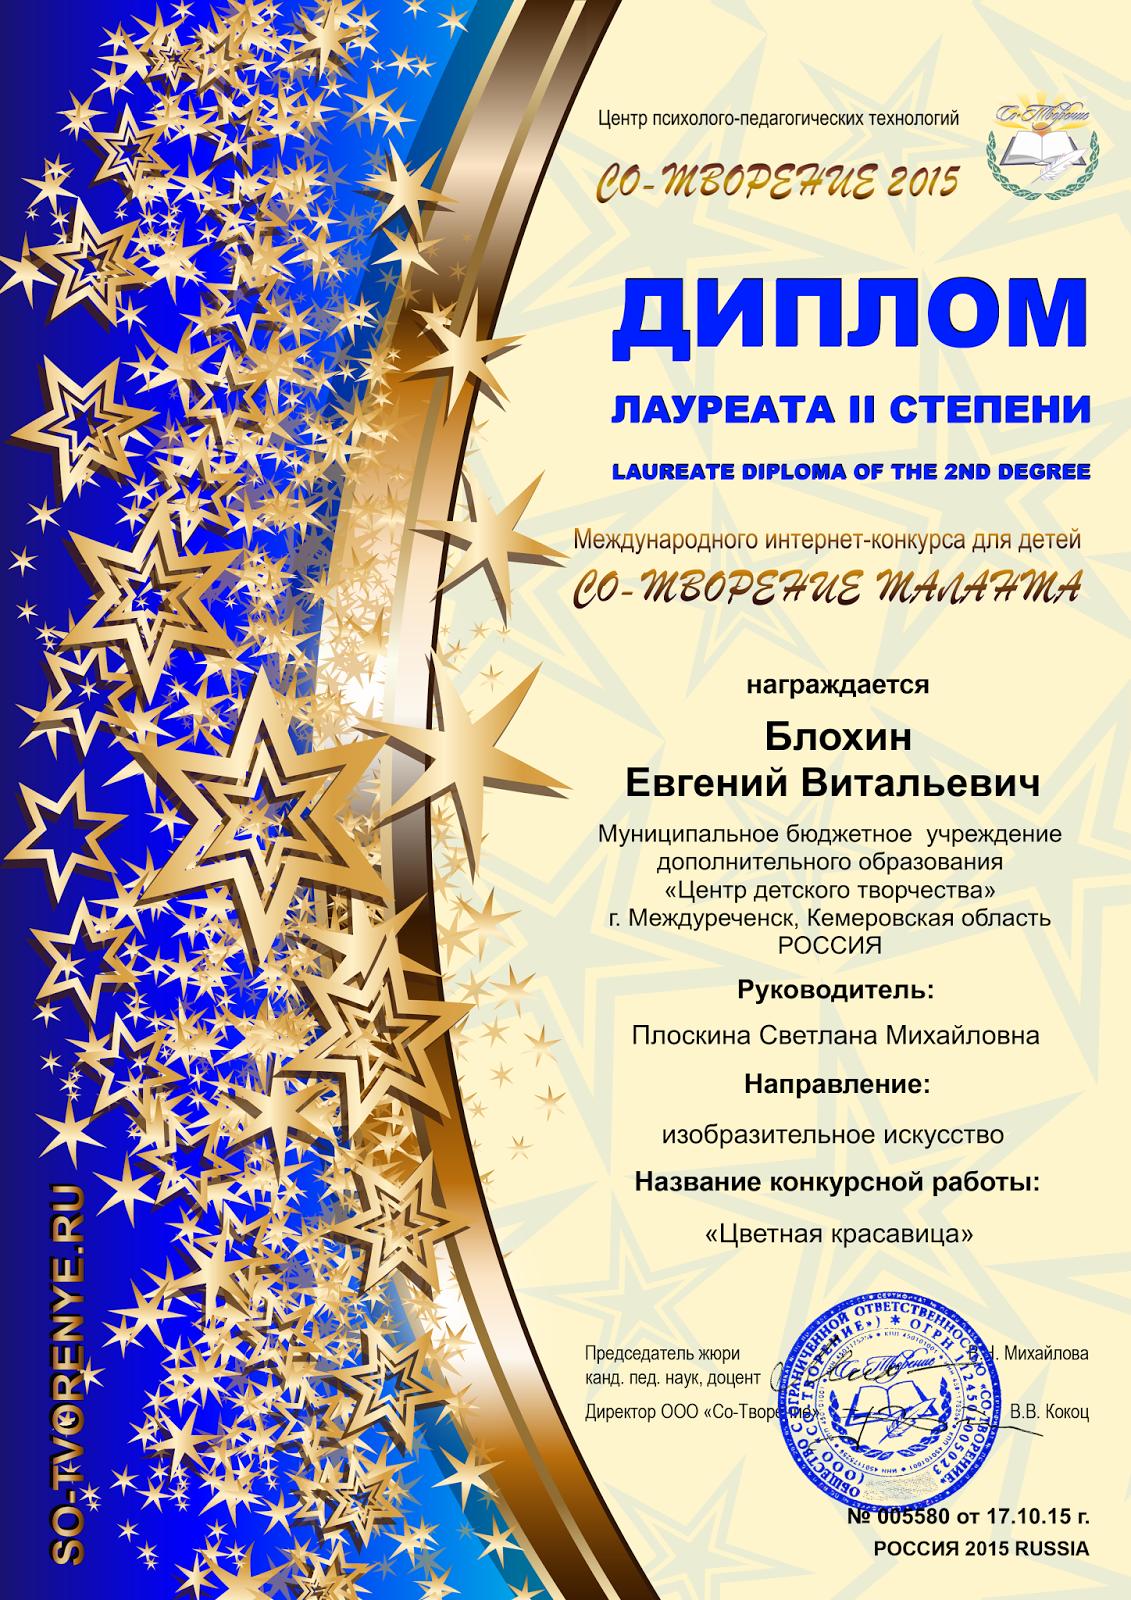 Конкурс выбирай успех курск 25 февраля 2017 года организаторы